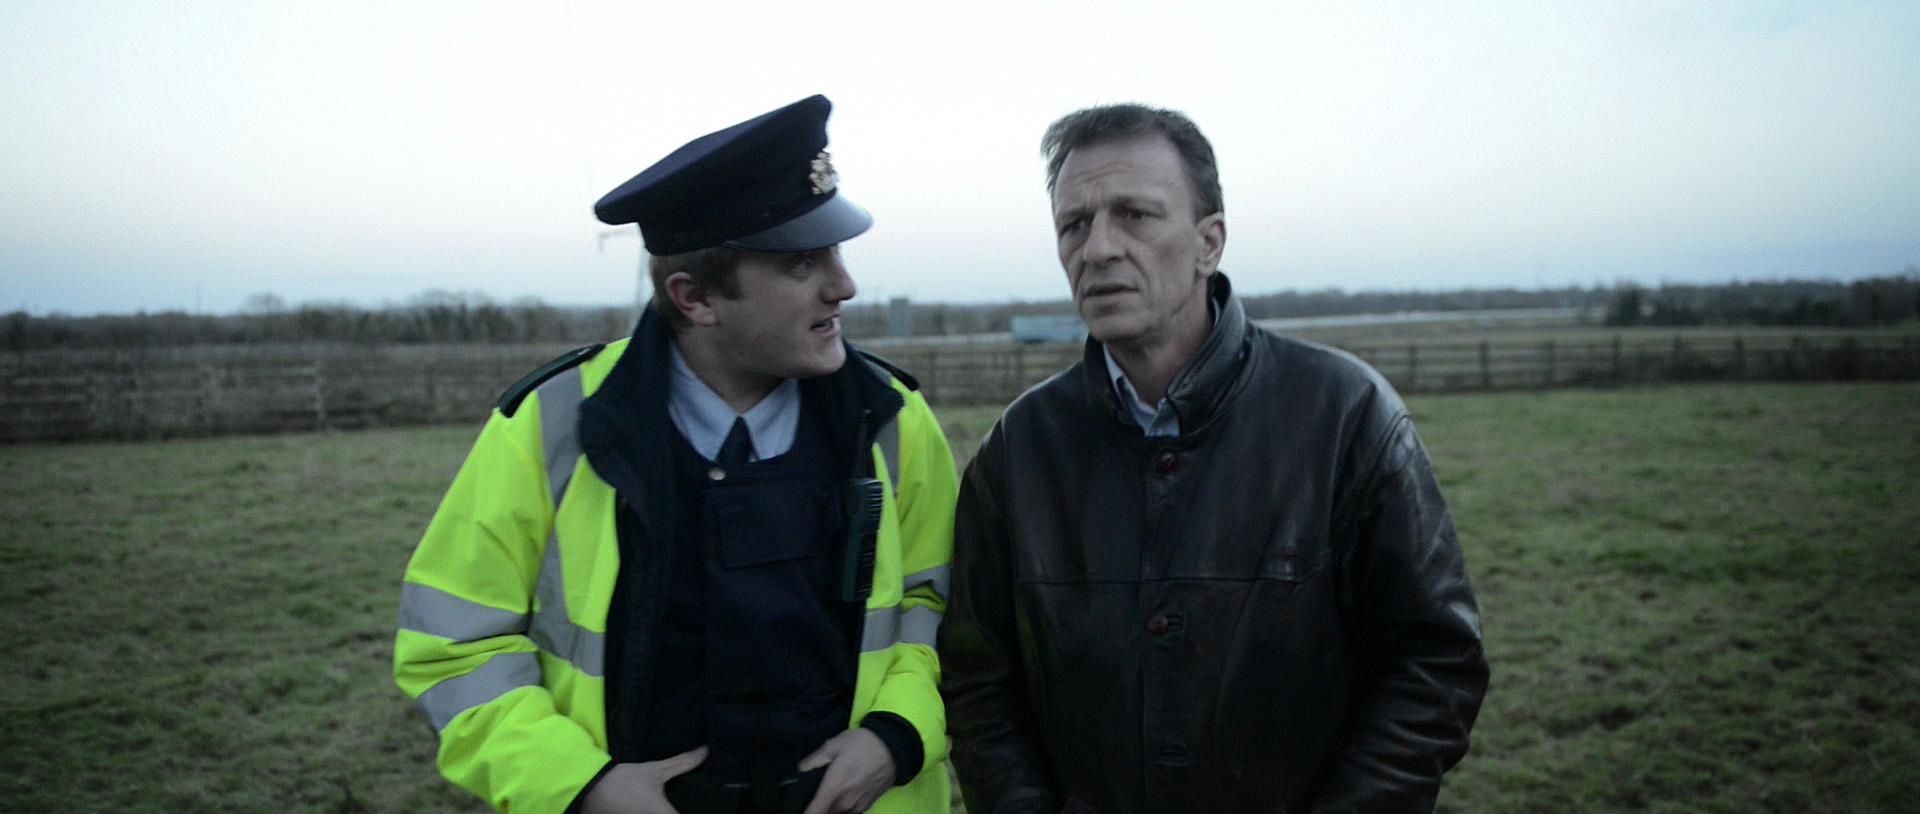 Network-Ireland-Television-Hit-Producer-THP-NITV-8.jpg